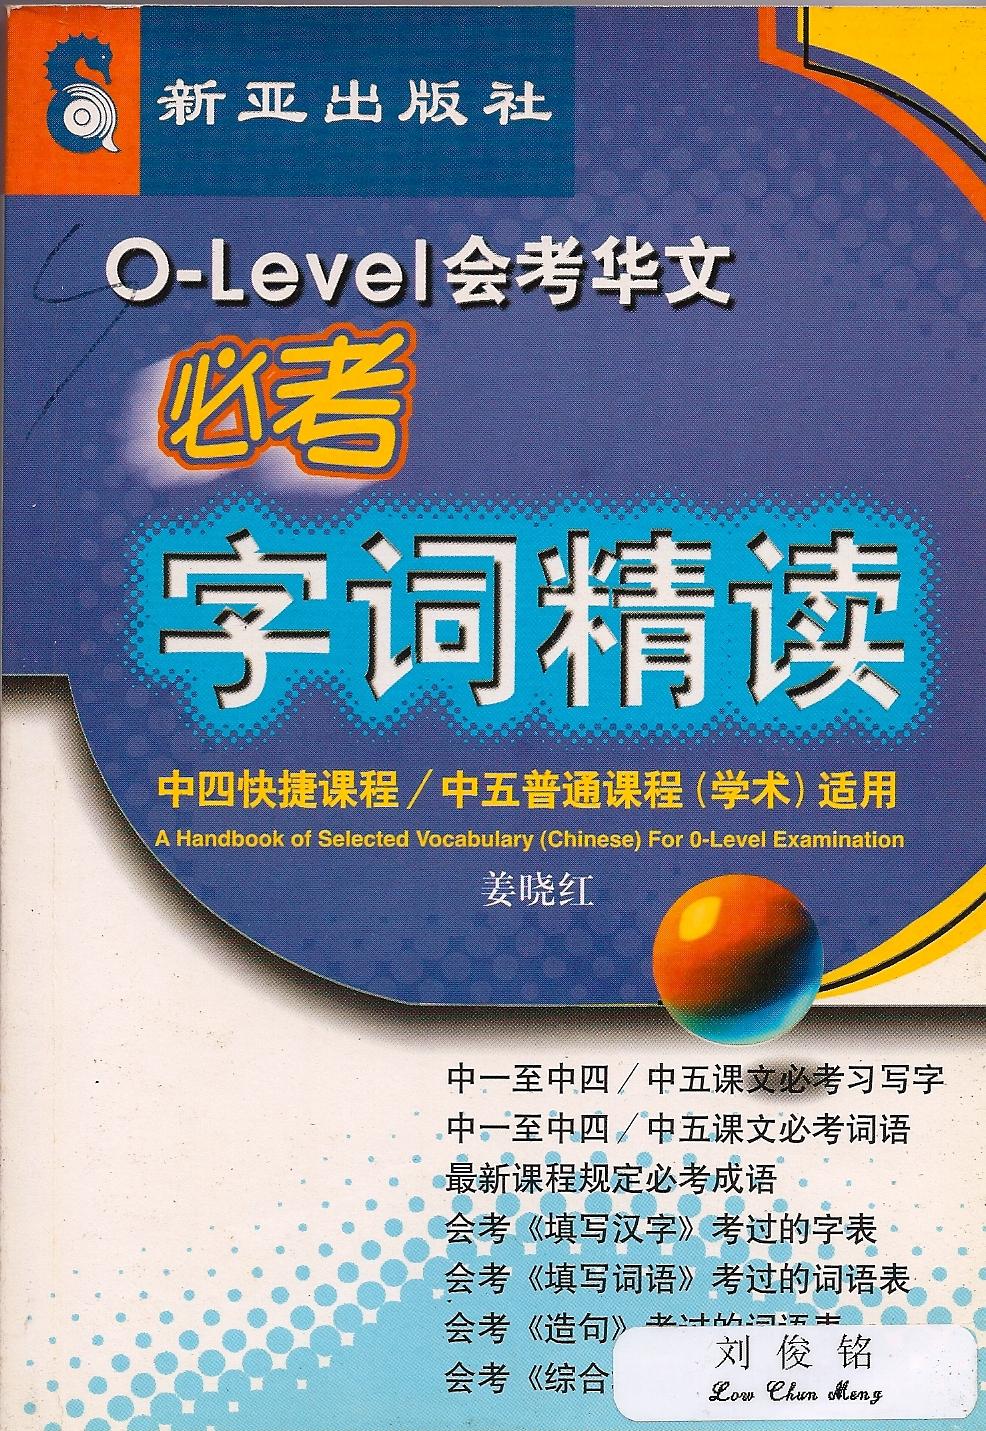 O-Level会考华文必考字词精读